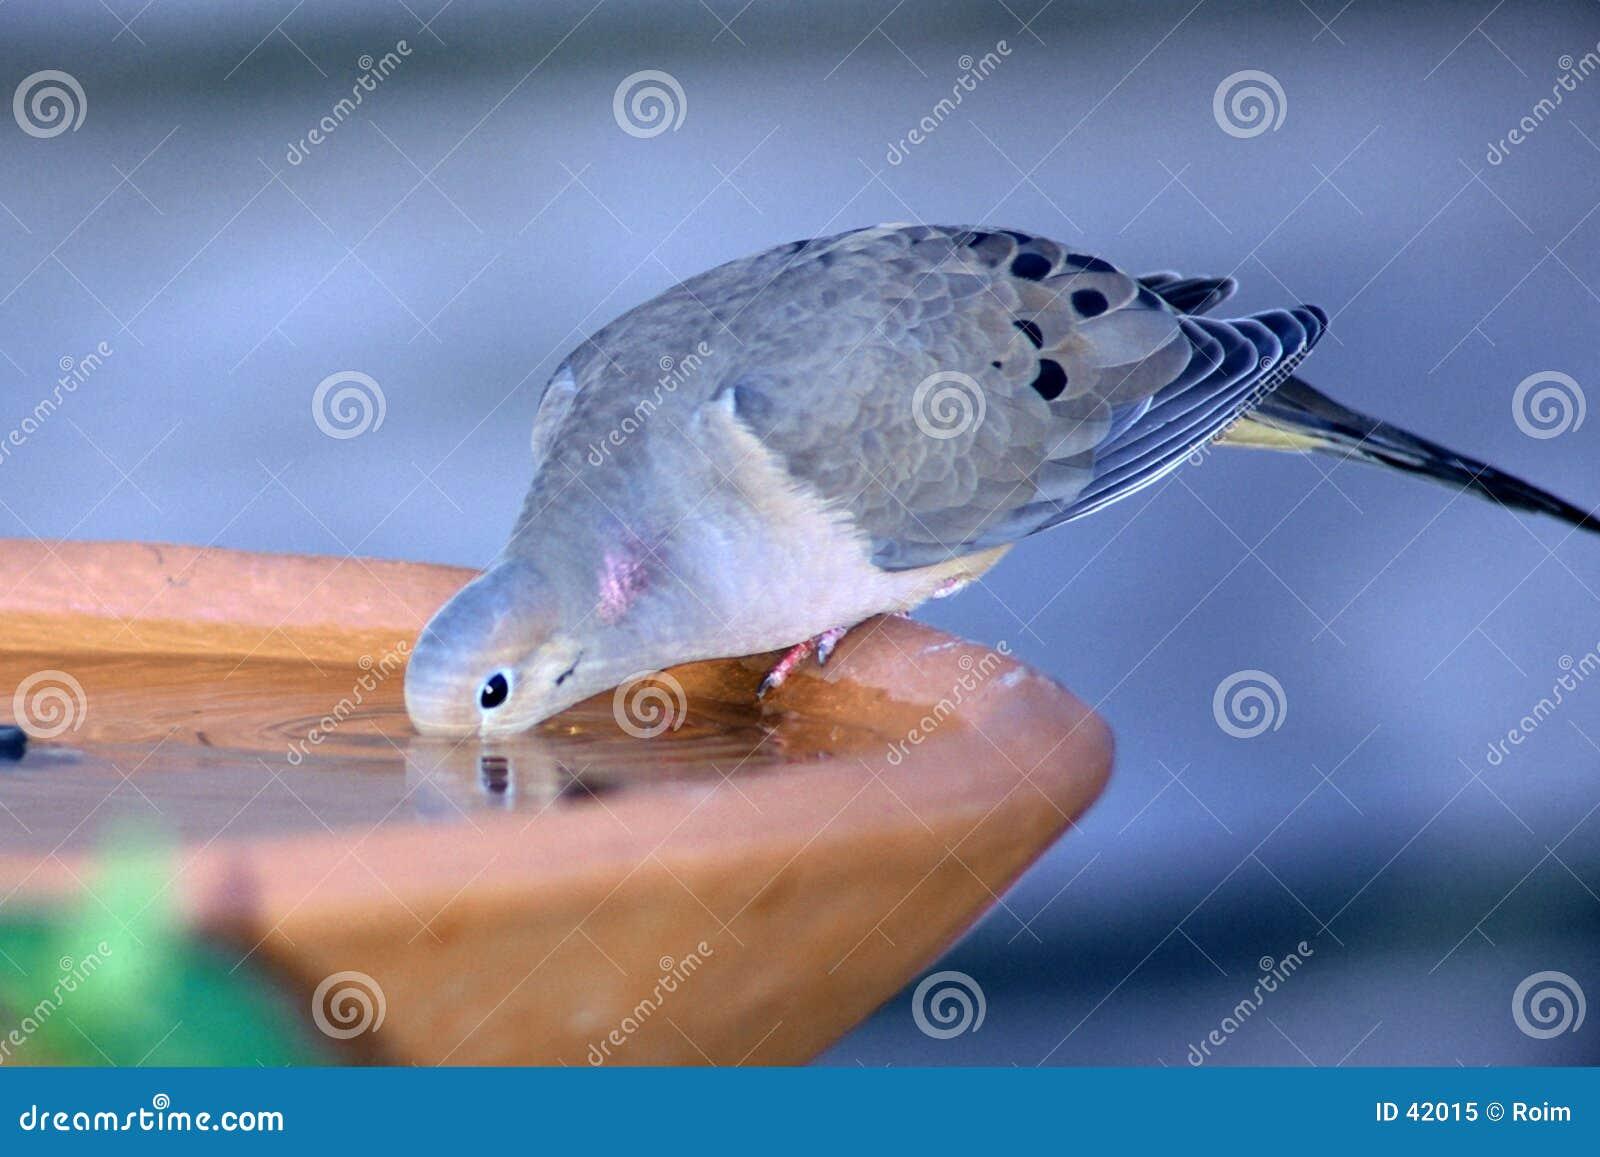 Dove Drinking